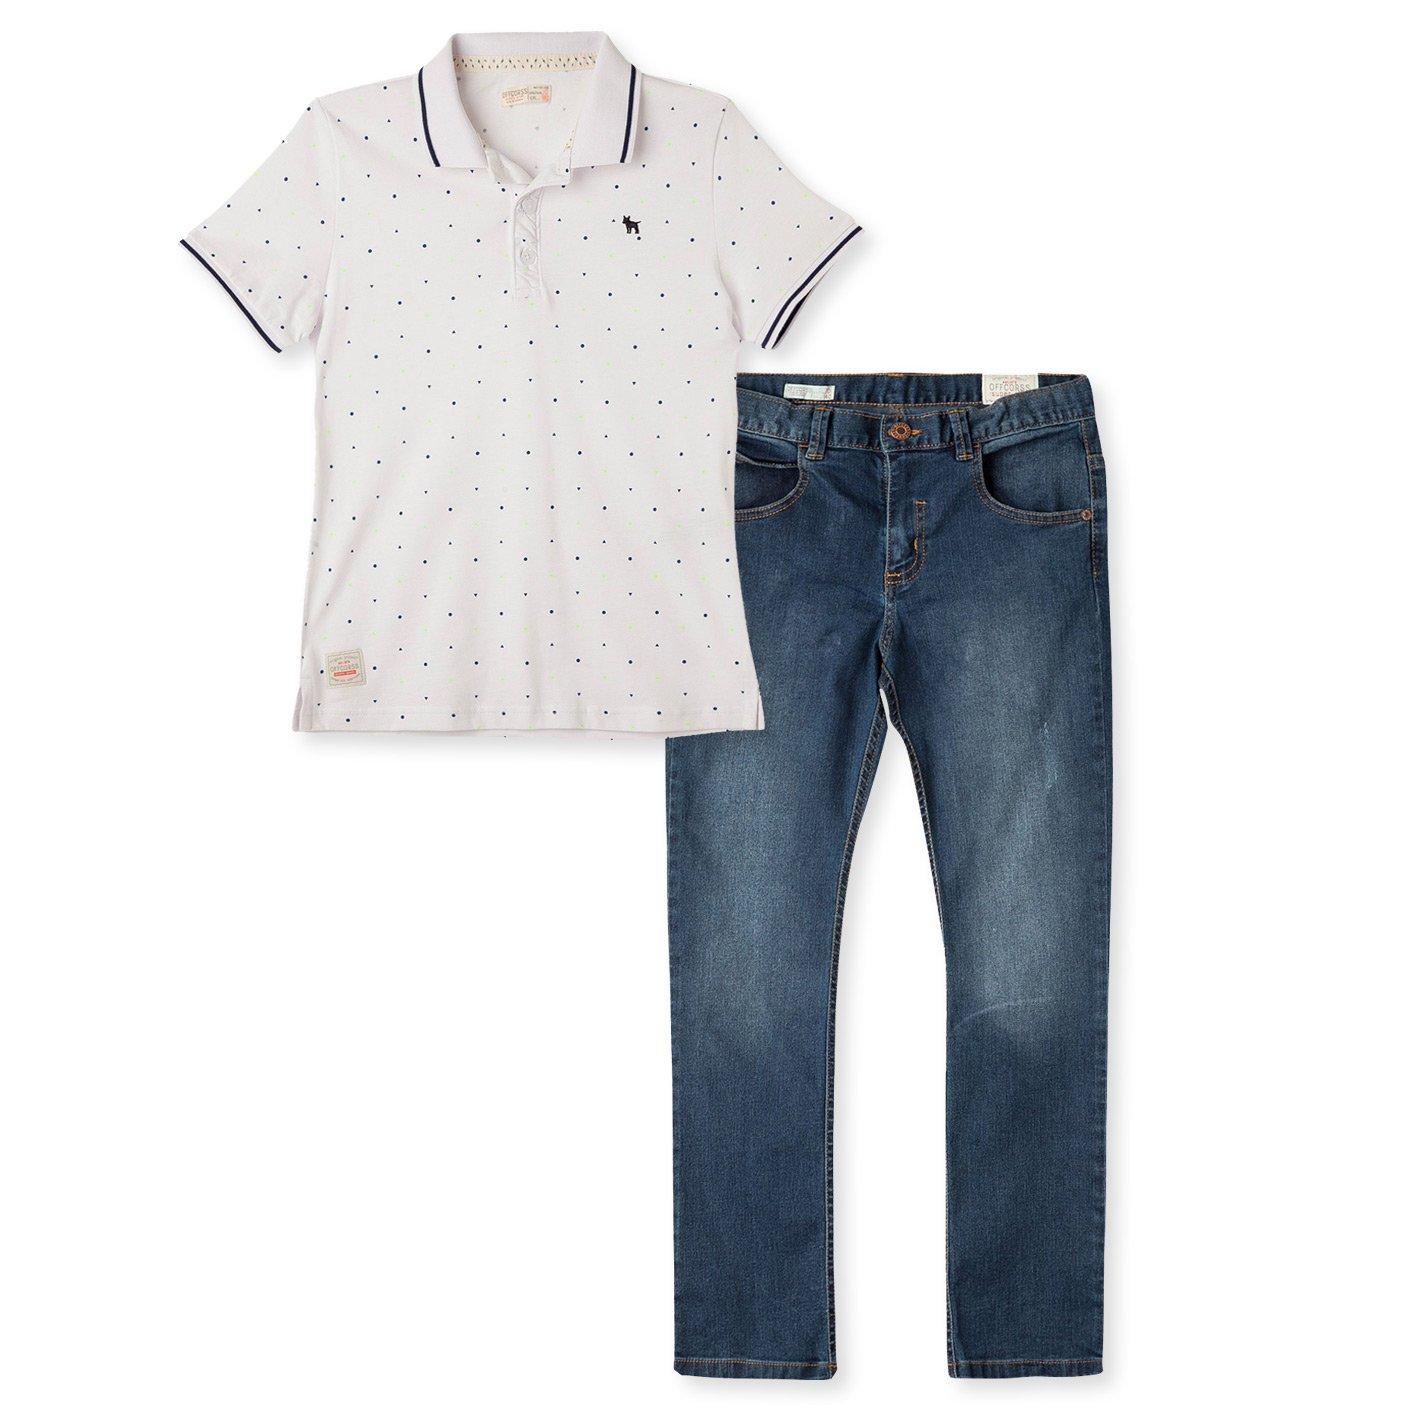 ed8bce79 Amazon.com: OFFCORSS Polo Shirts Jeans for Boys: Clothing